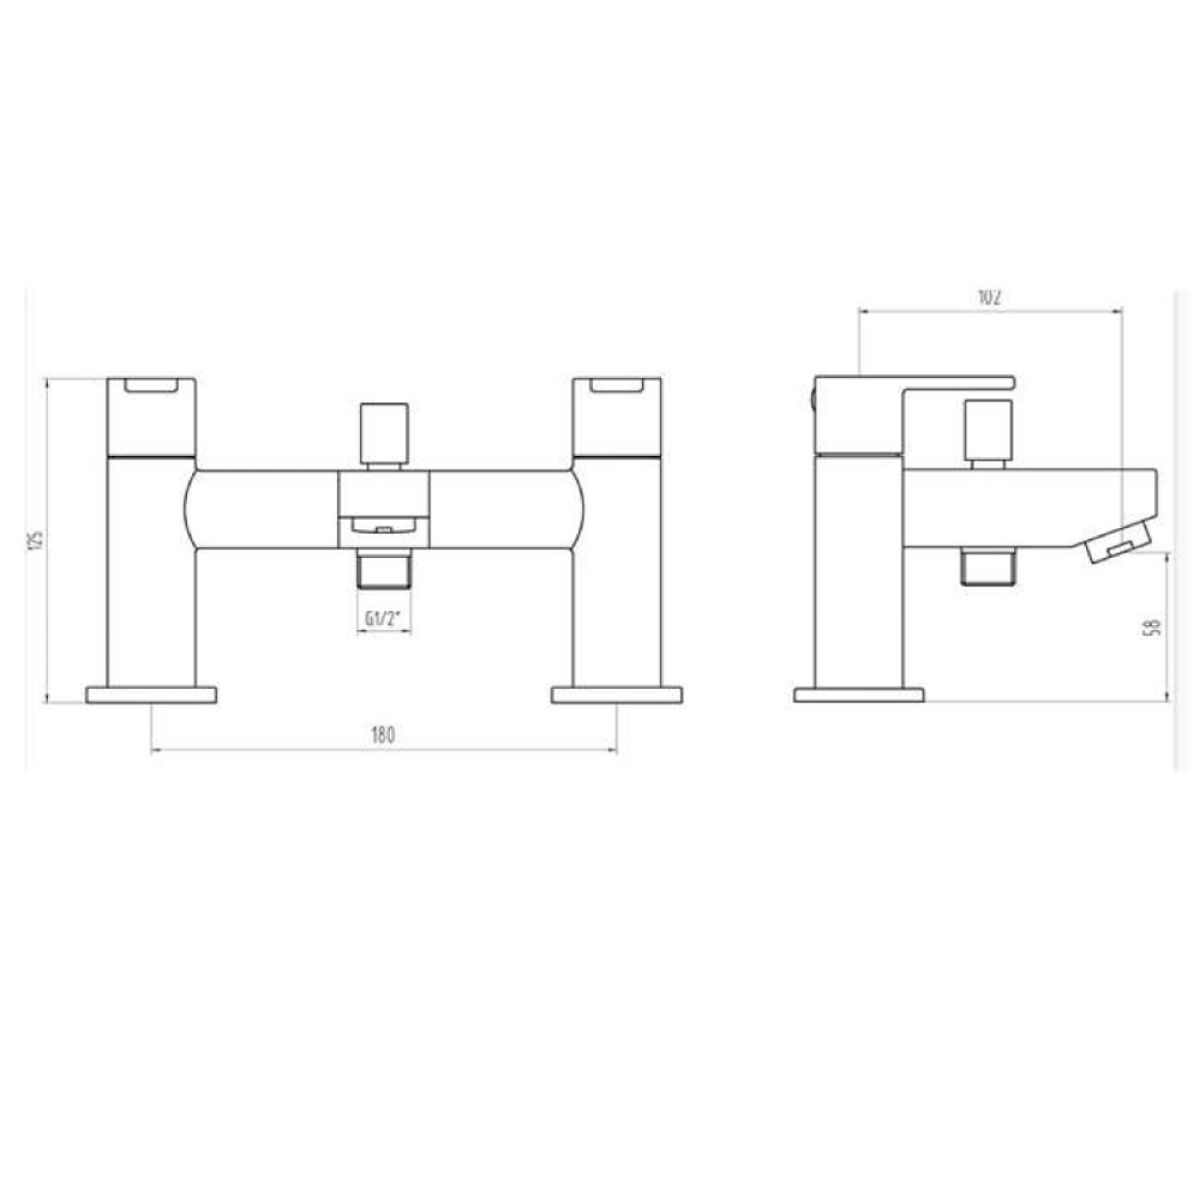 RAK Morning Deck Mounted Shower Bath Mixer Tap Measurements